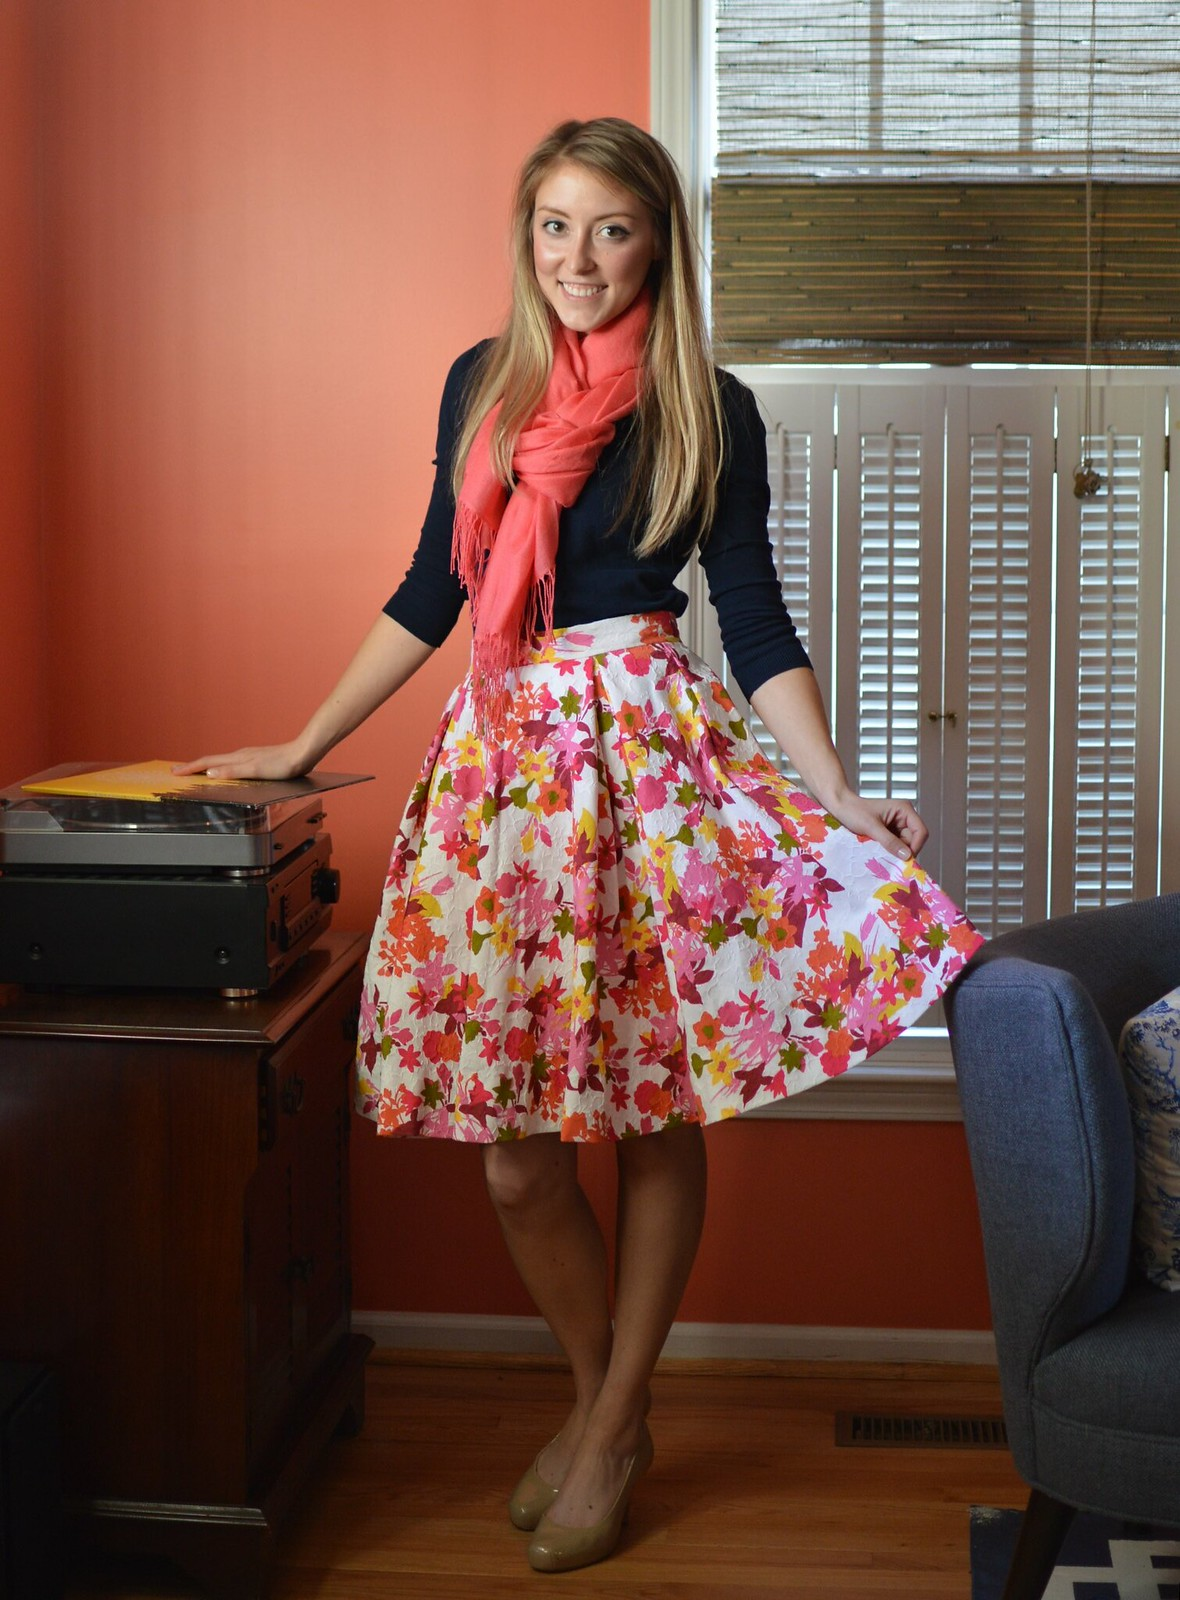 gertie skirt | allie J. | alliemjackson.com